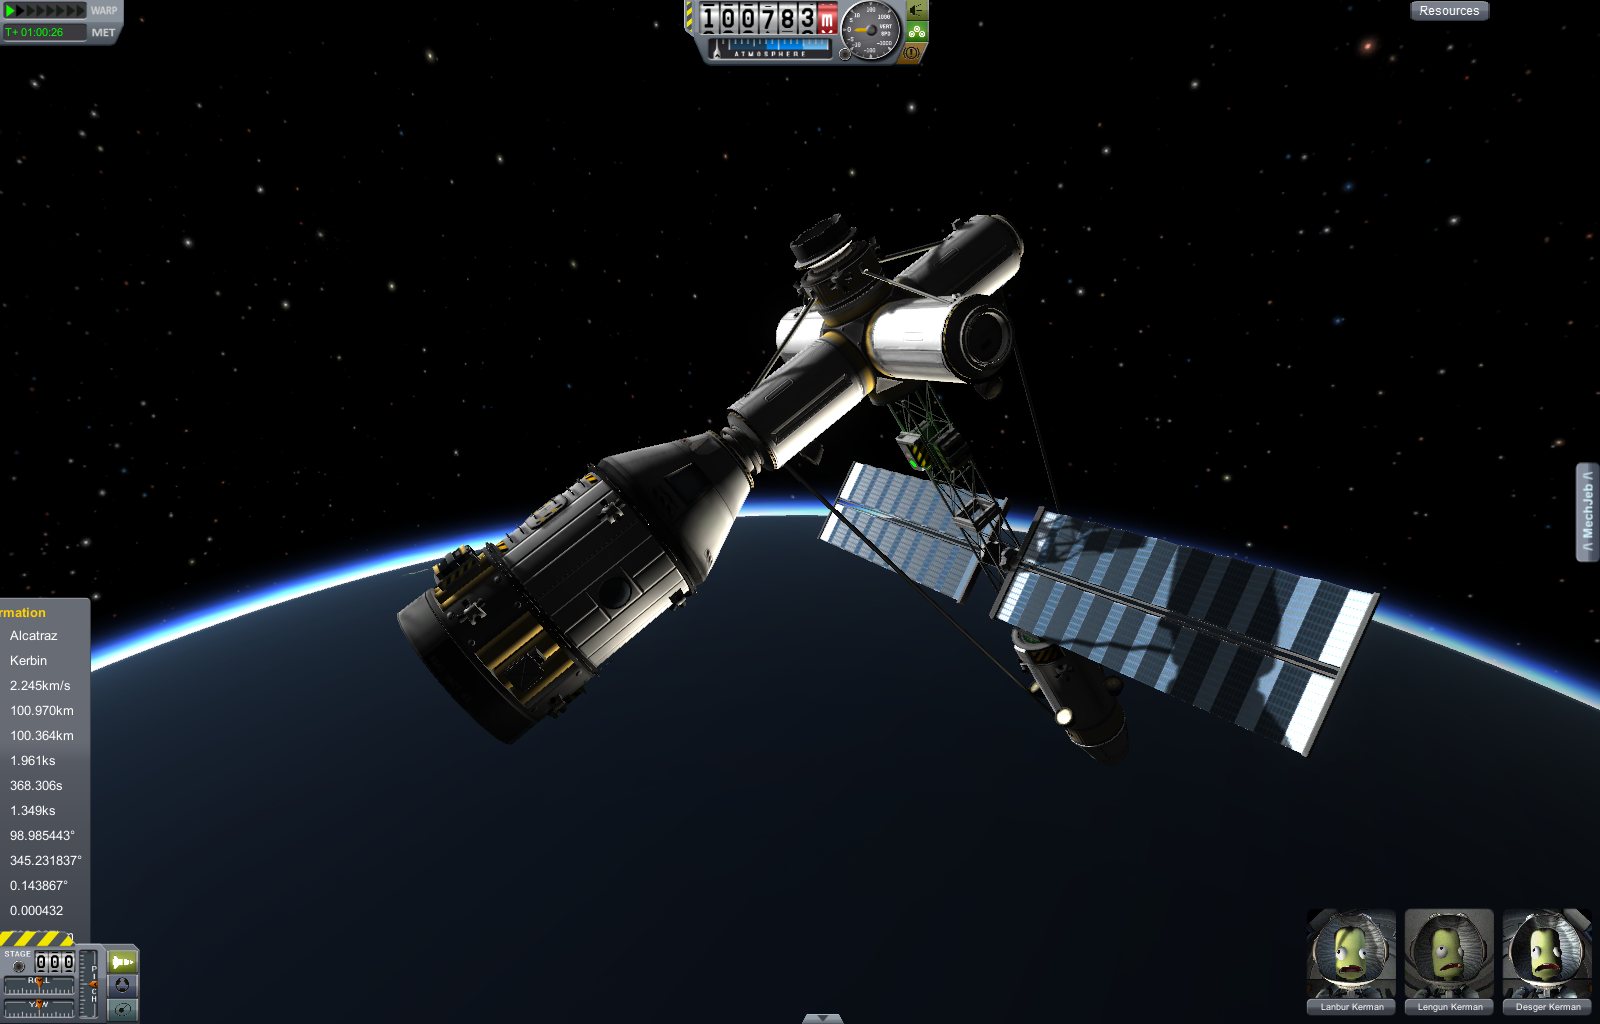 kerbal space program space station - photo #20